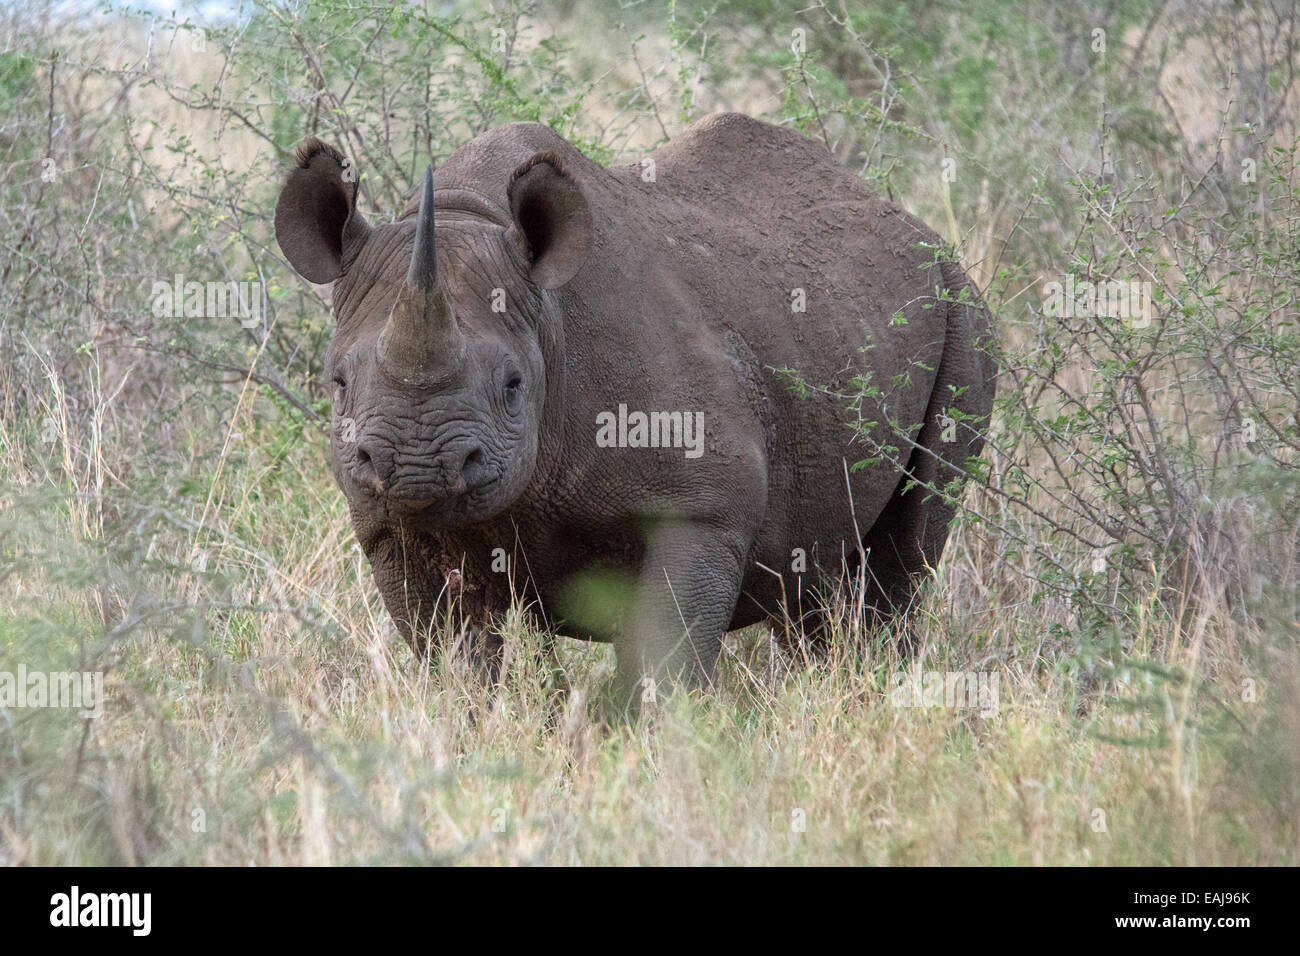 Charge, Black rhino - Stock Image